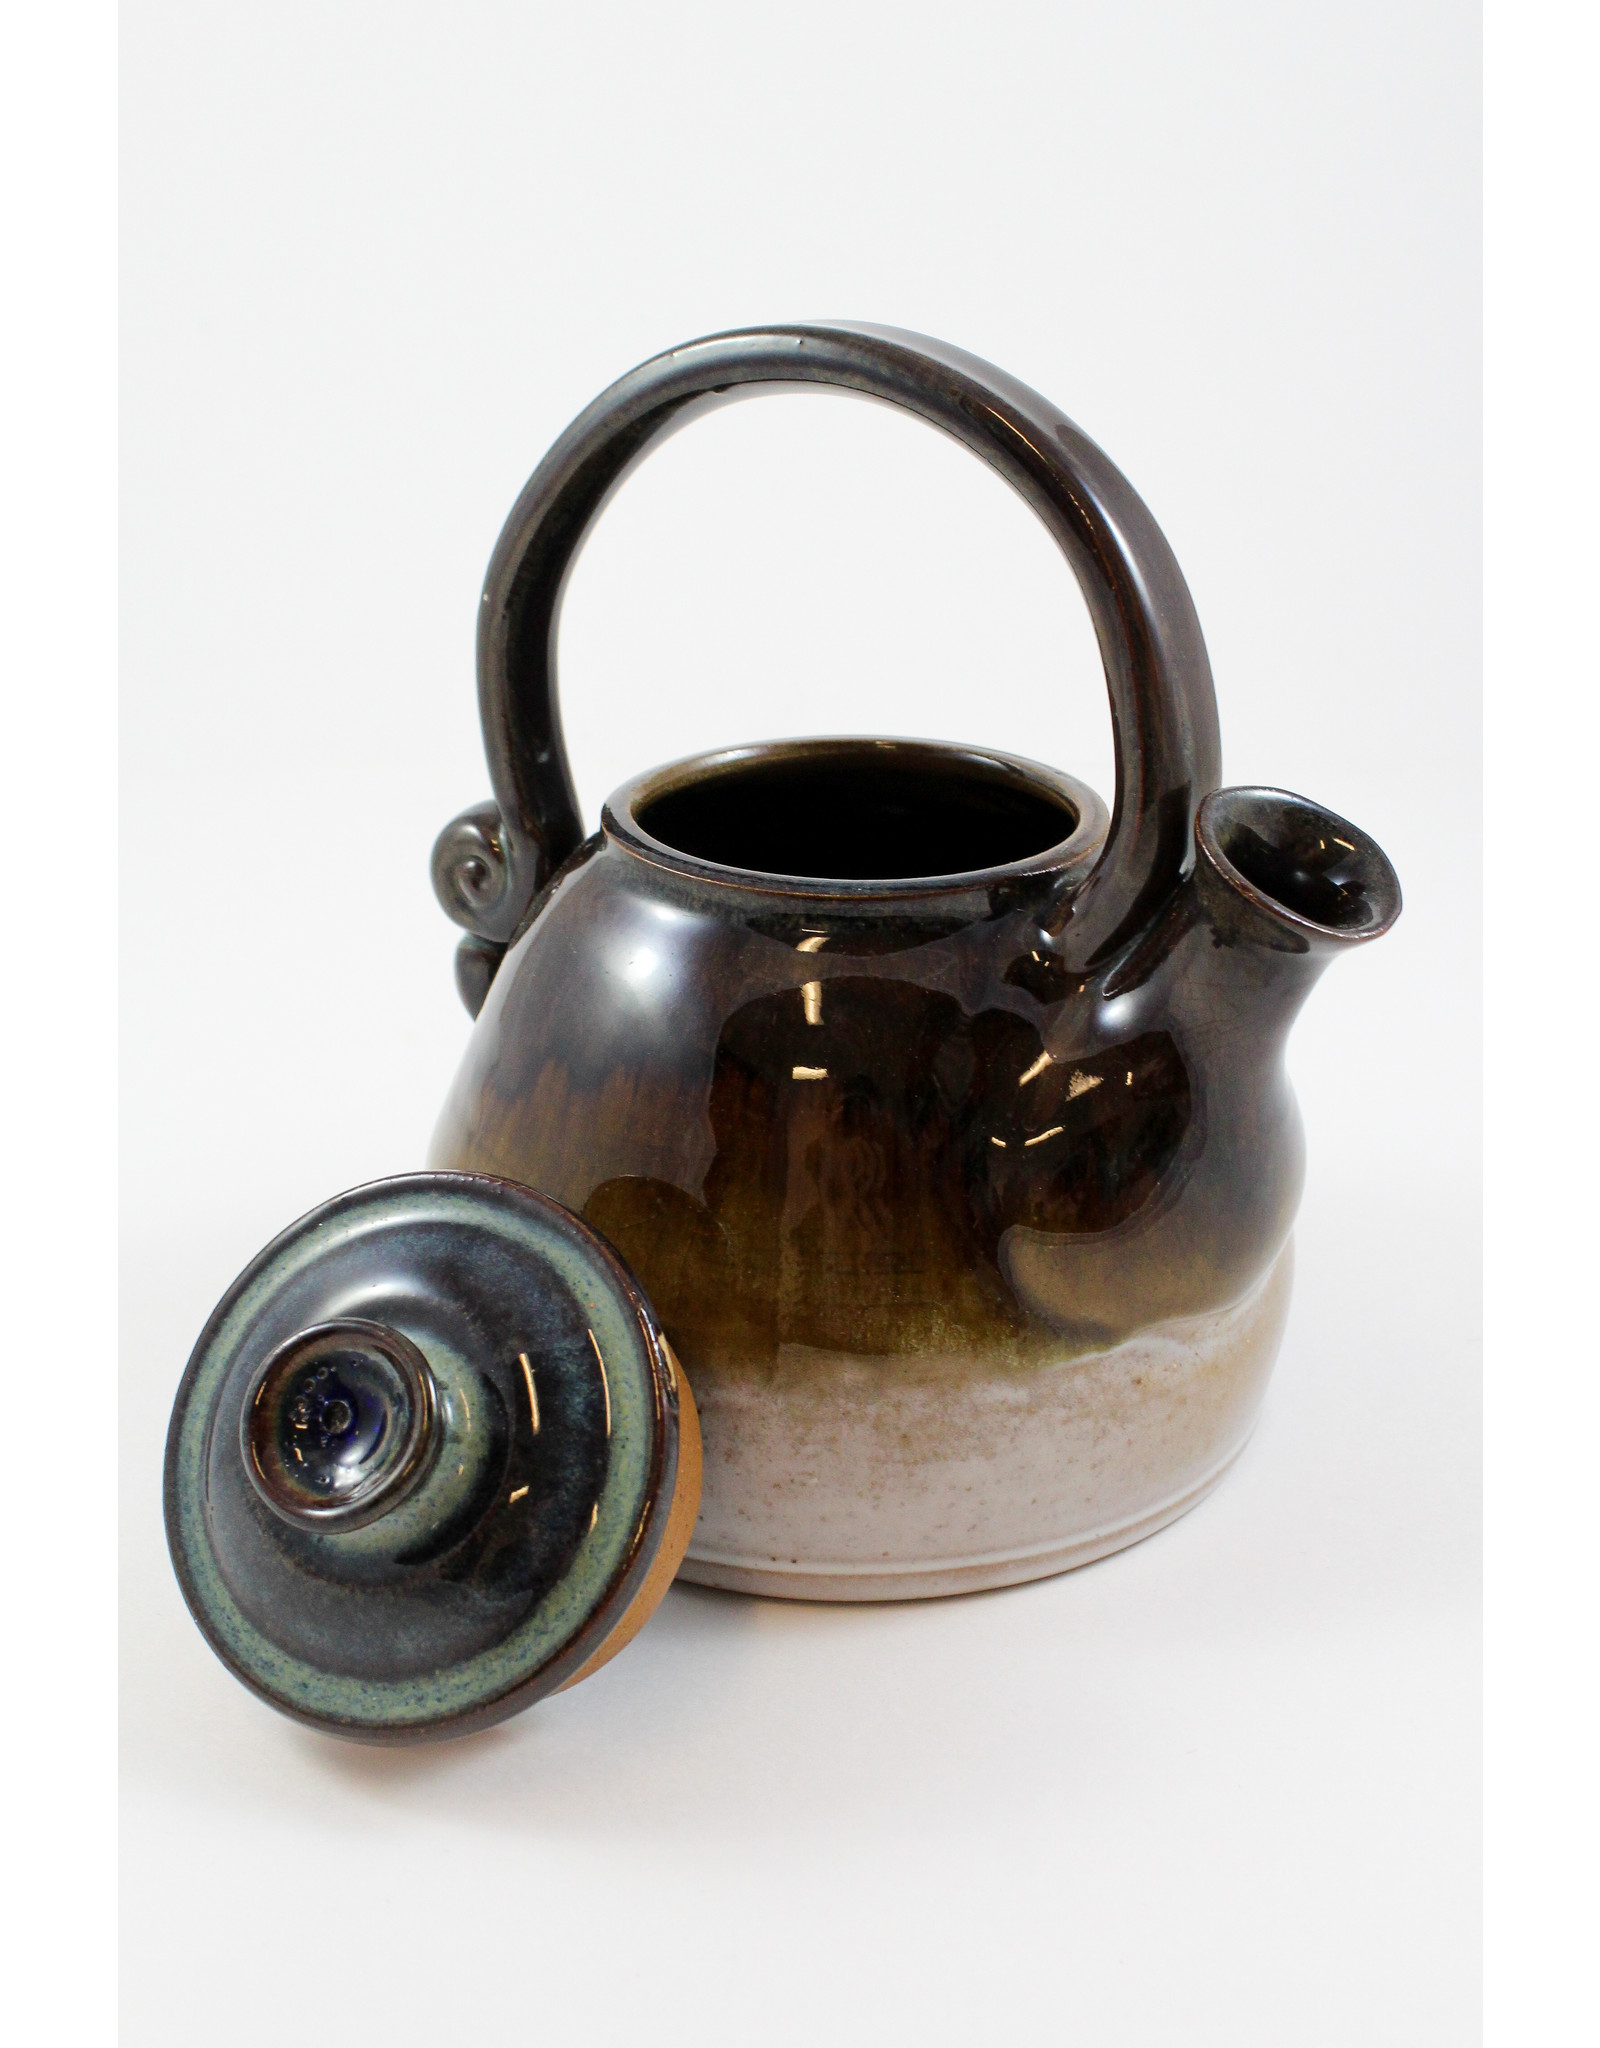 Jitka Zgola Flat-Bottomed Teapot by Jitka Zgola